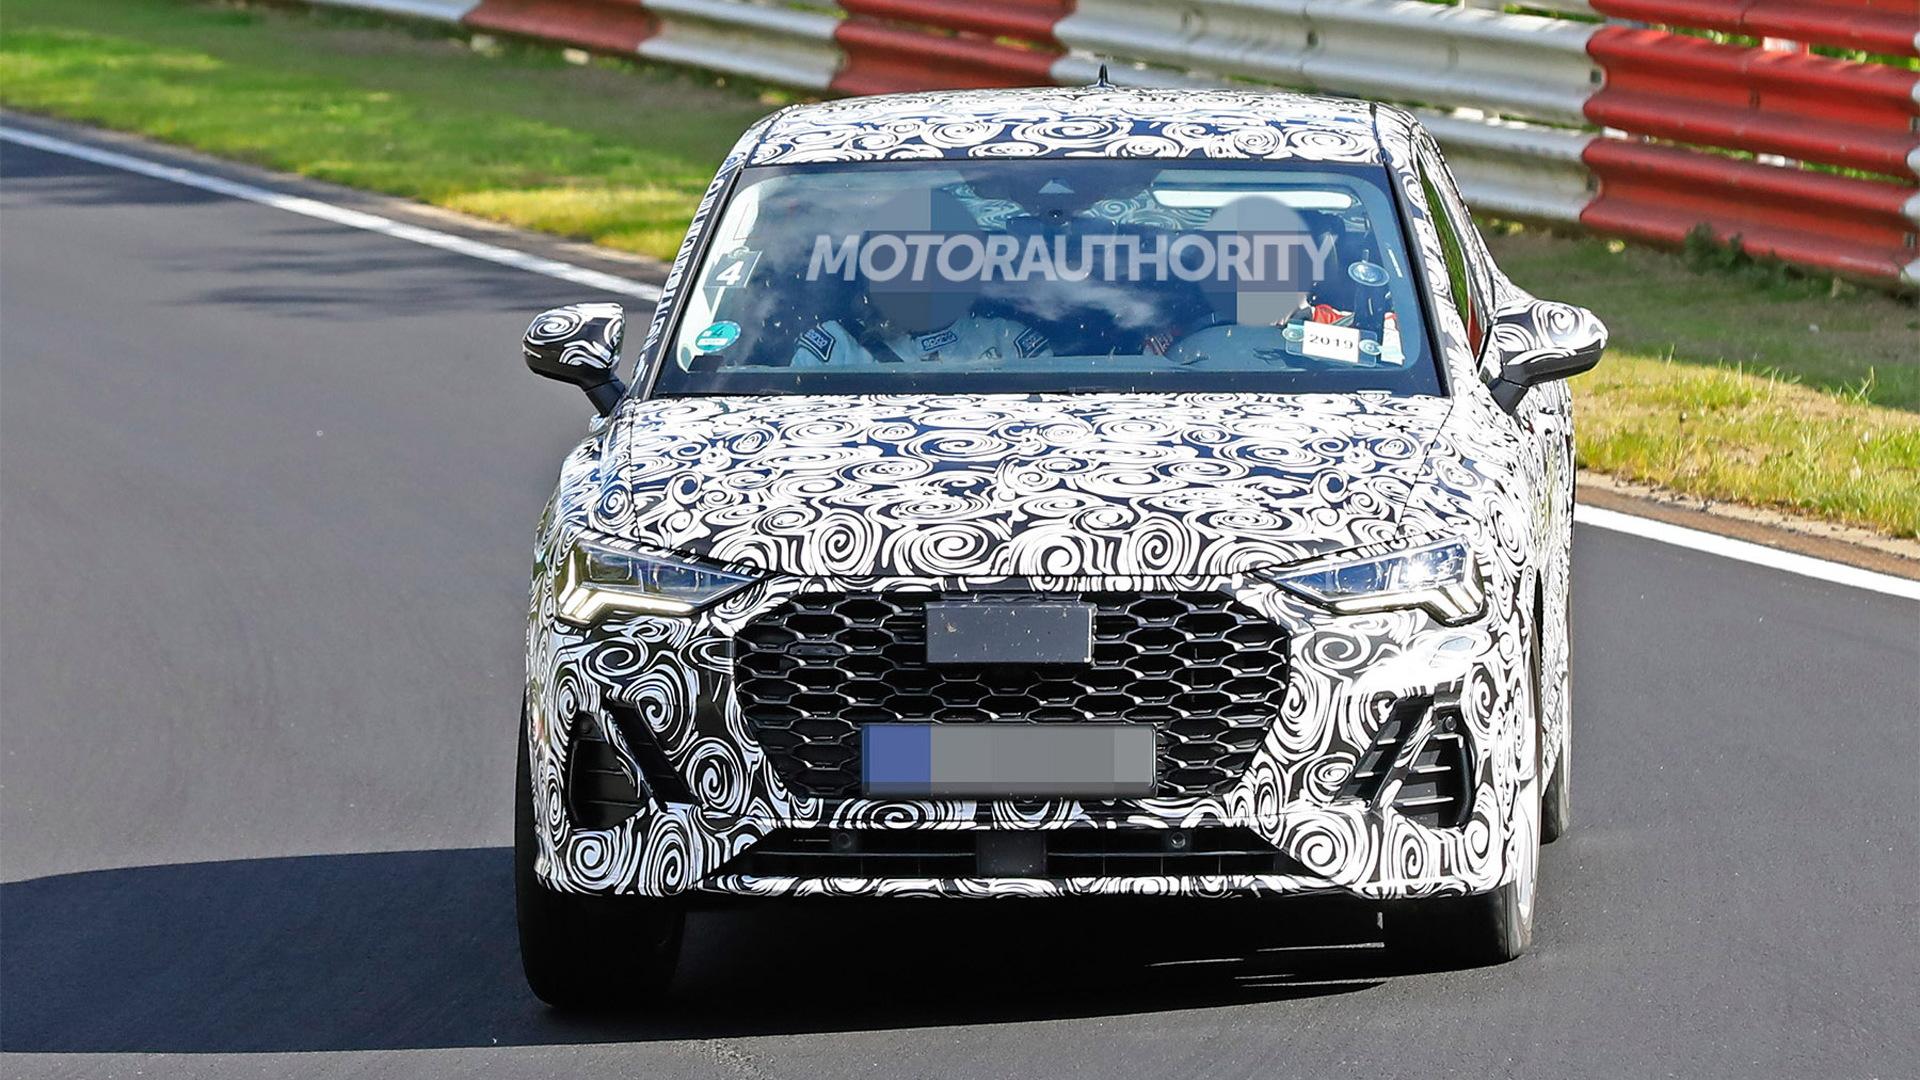 2020 Audi Q3 Sportback spy shots - Image via S. Baldauf/SB-Medien